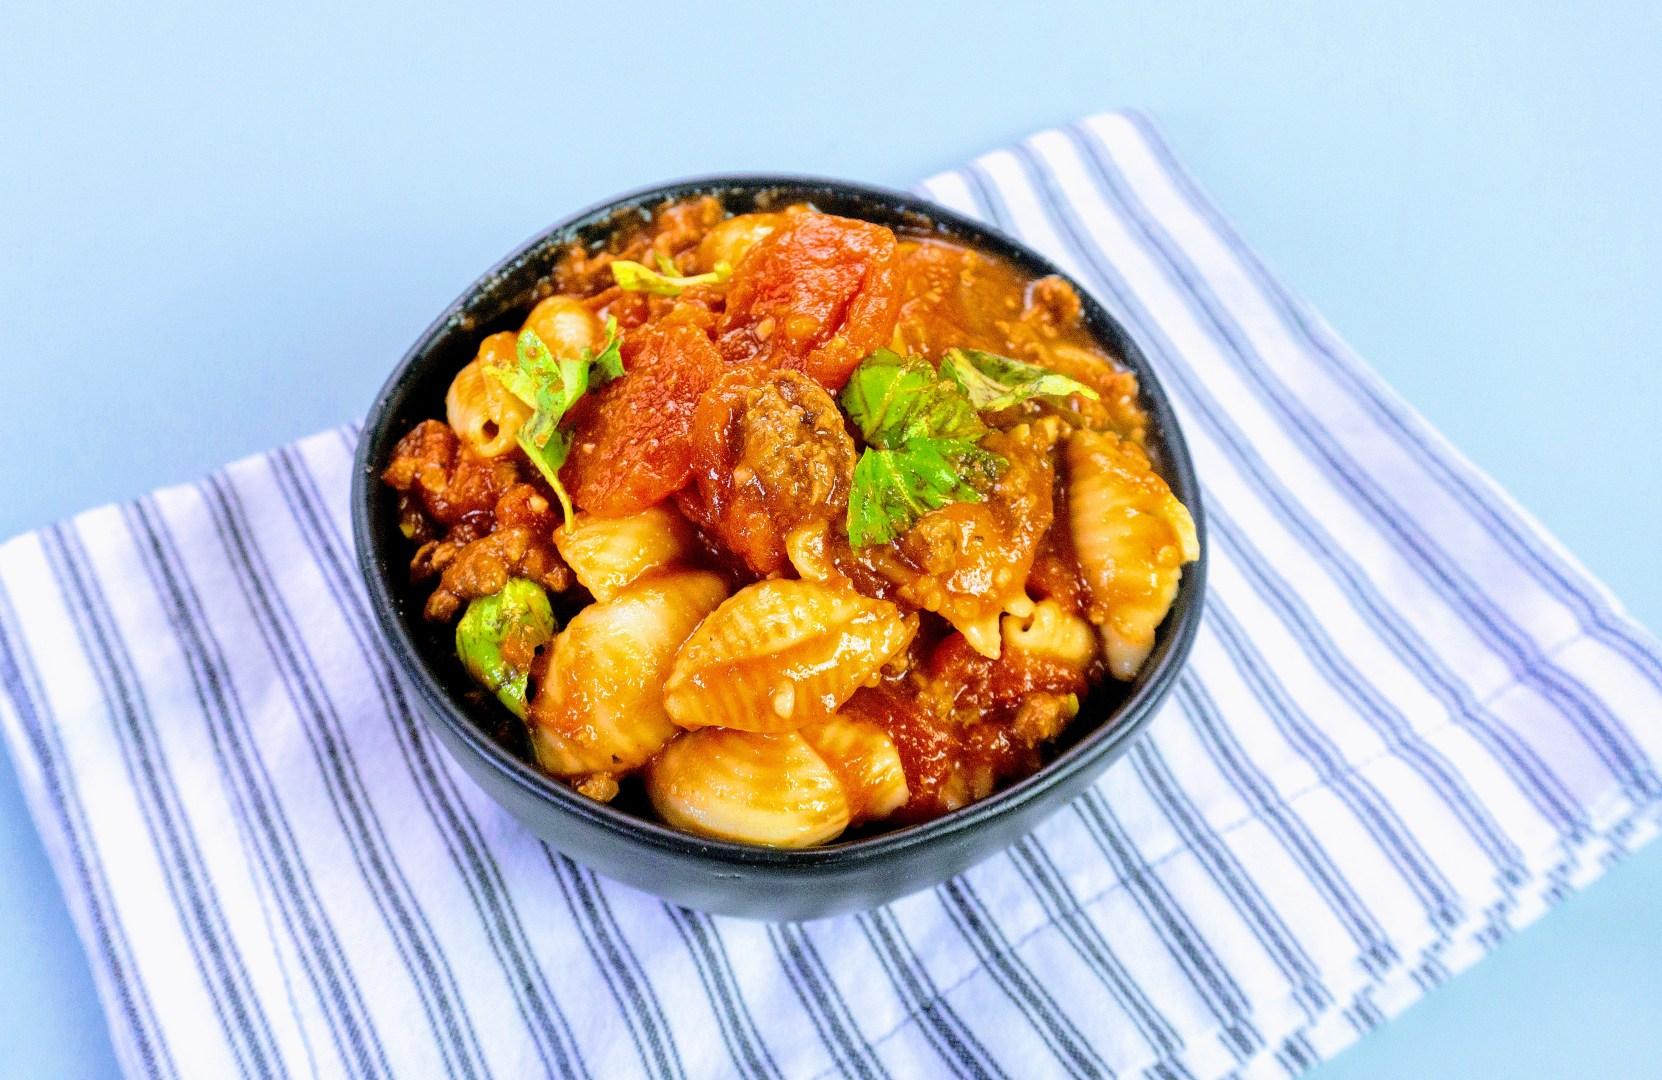 Enjoy a bowl of hearty Italian goulash